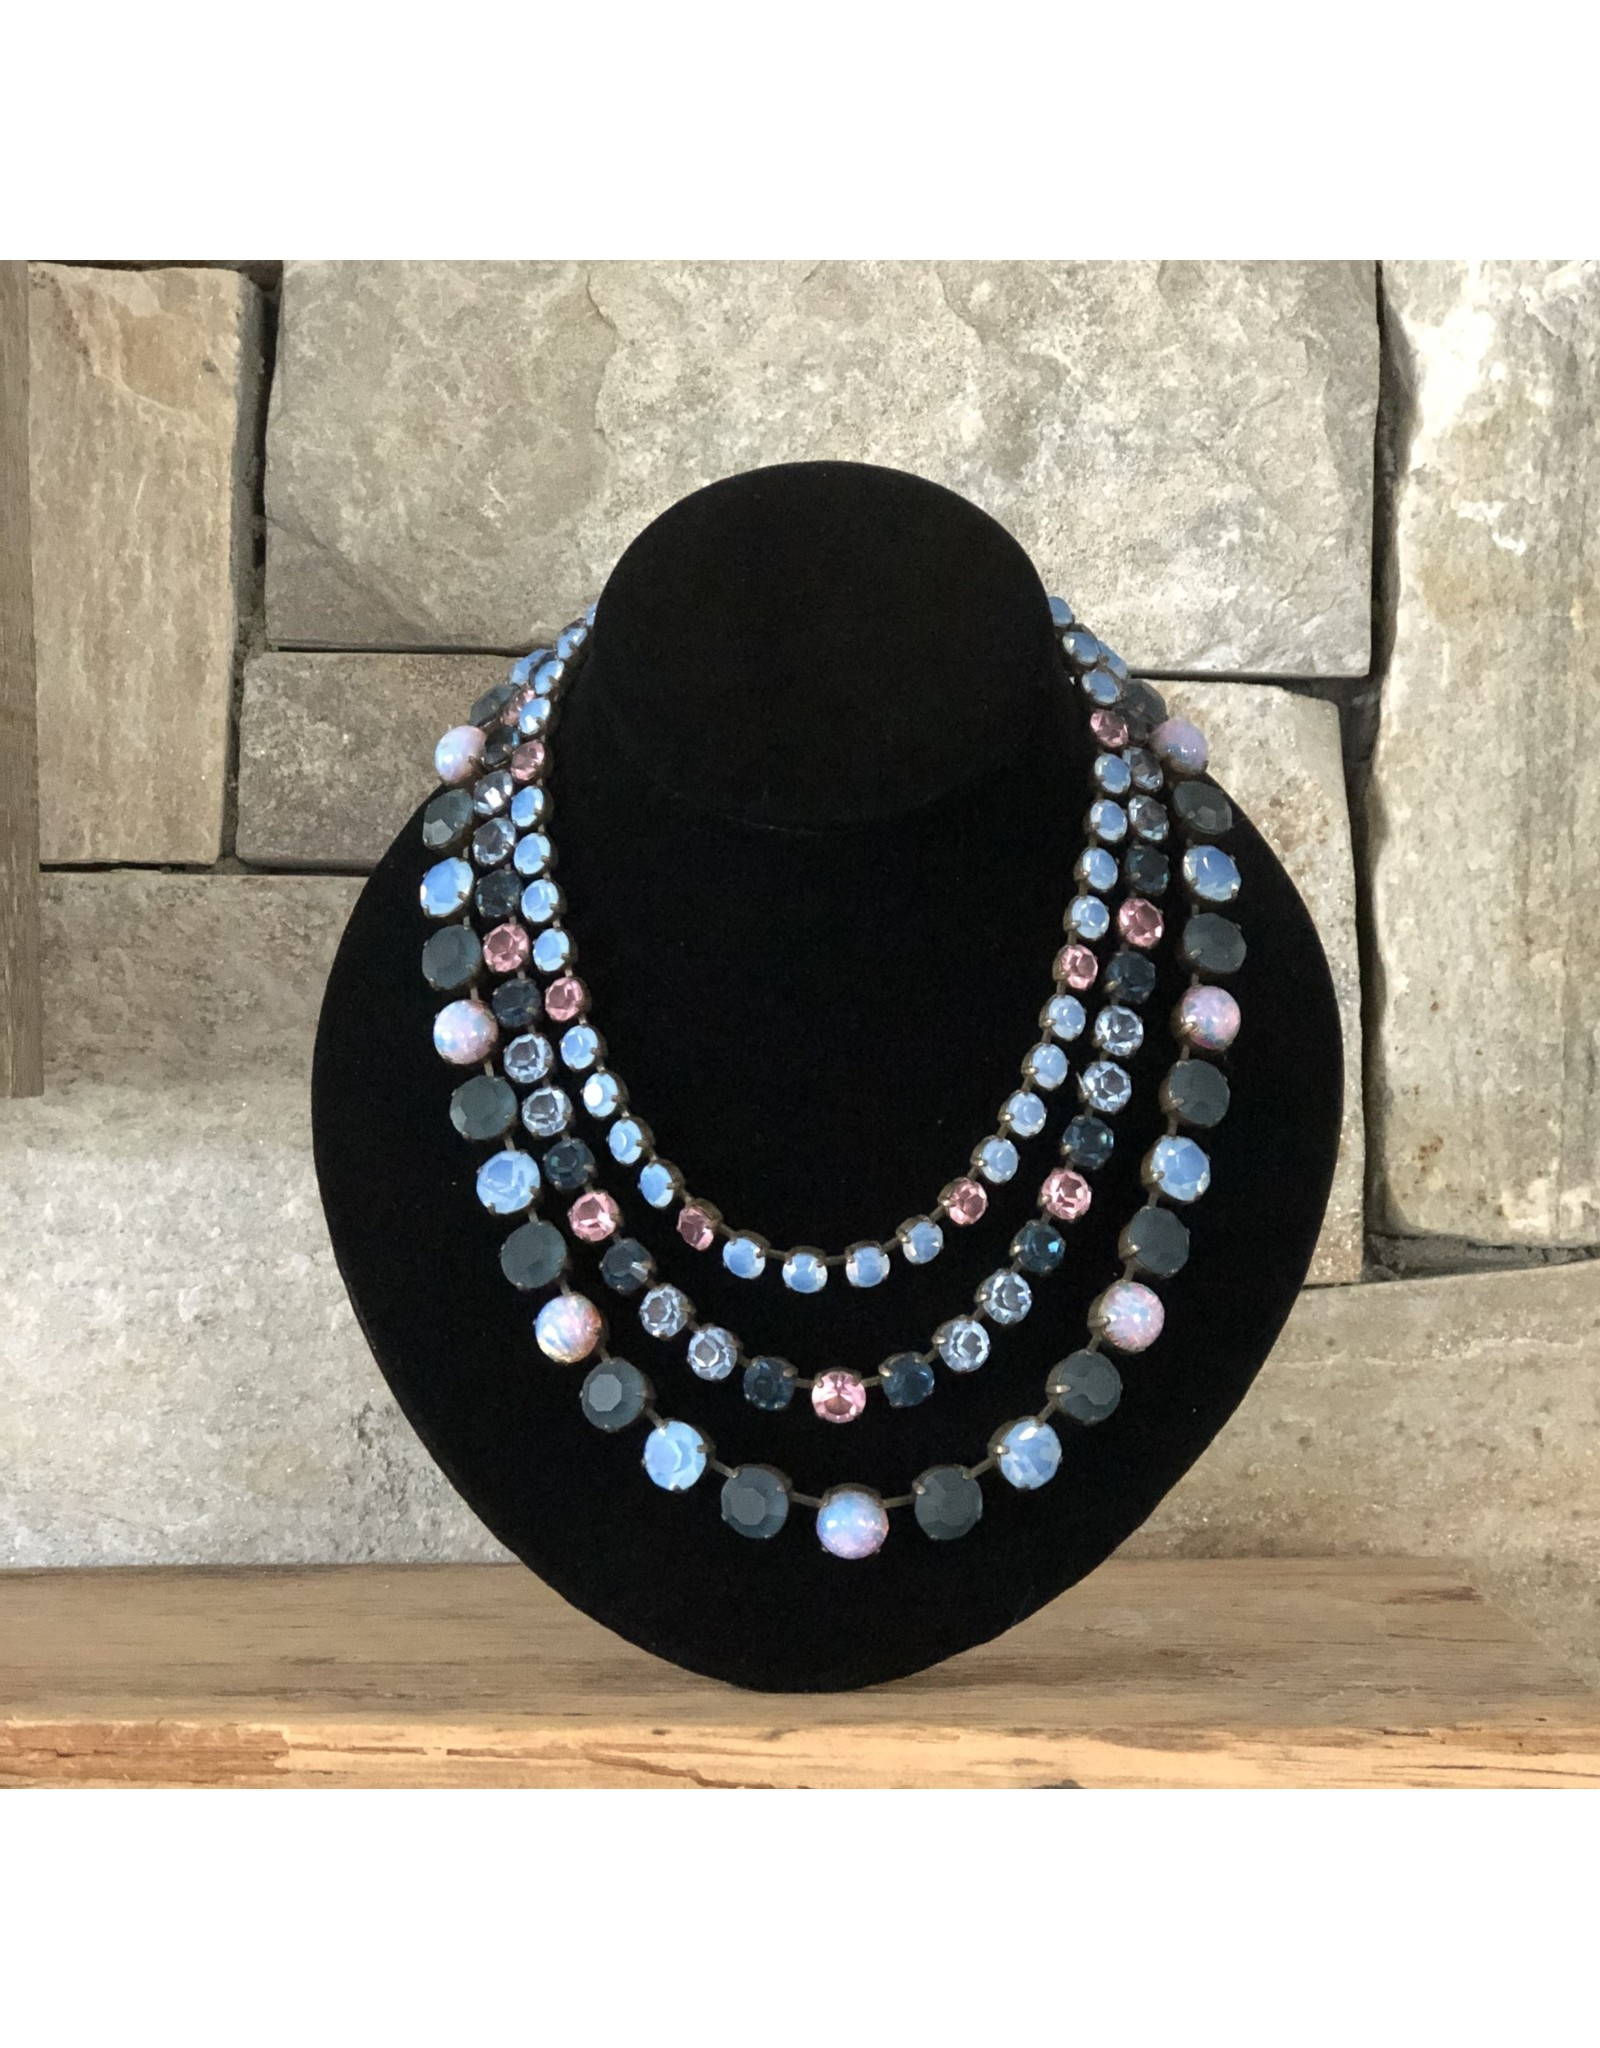 Jean Louis Blinn 3 Strands Crystals Necklace